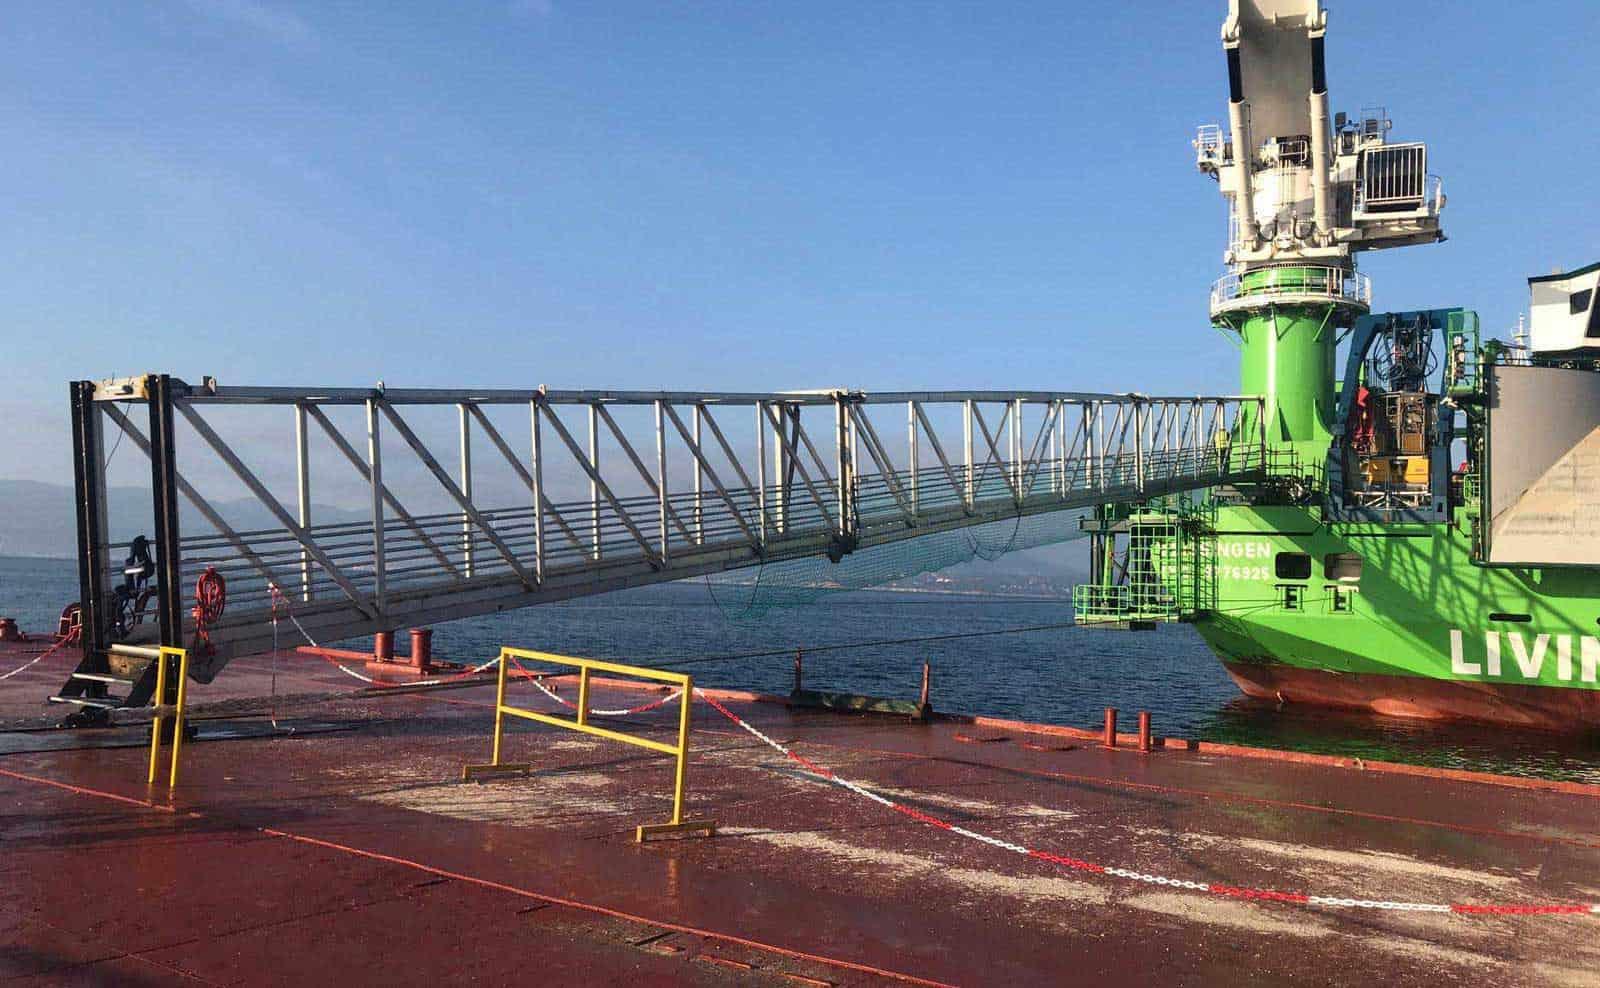 BRIDGES2000 Access to Kabellegger schip 1